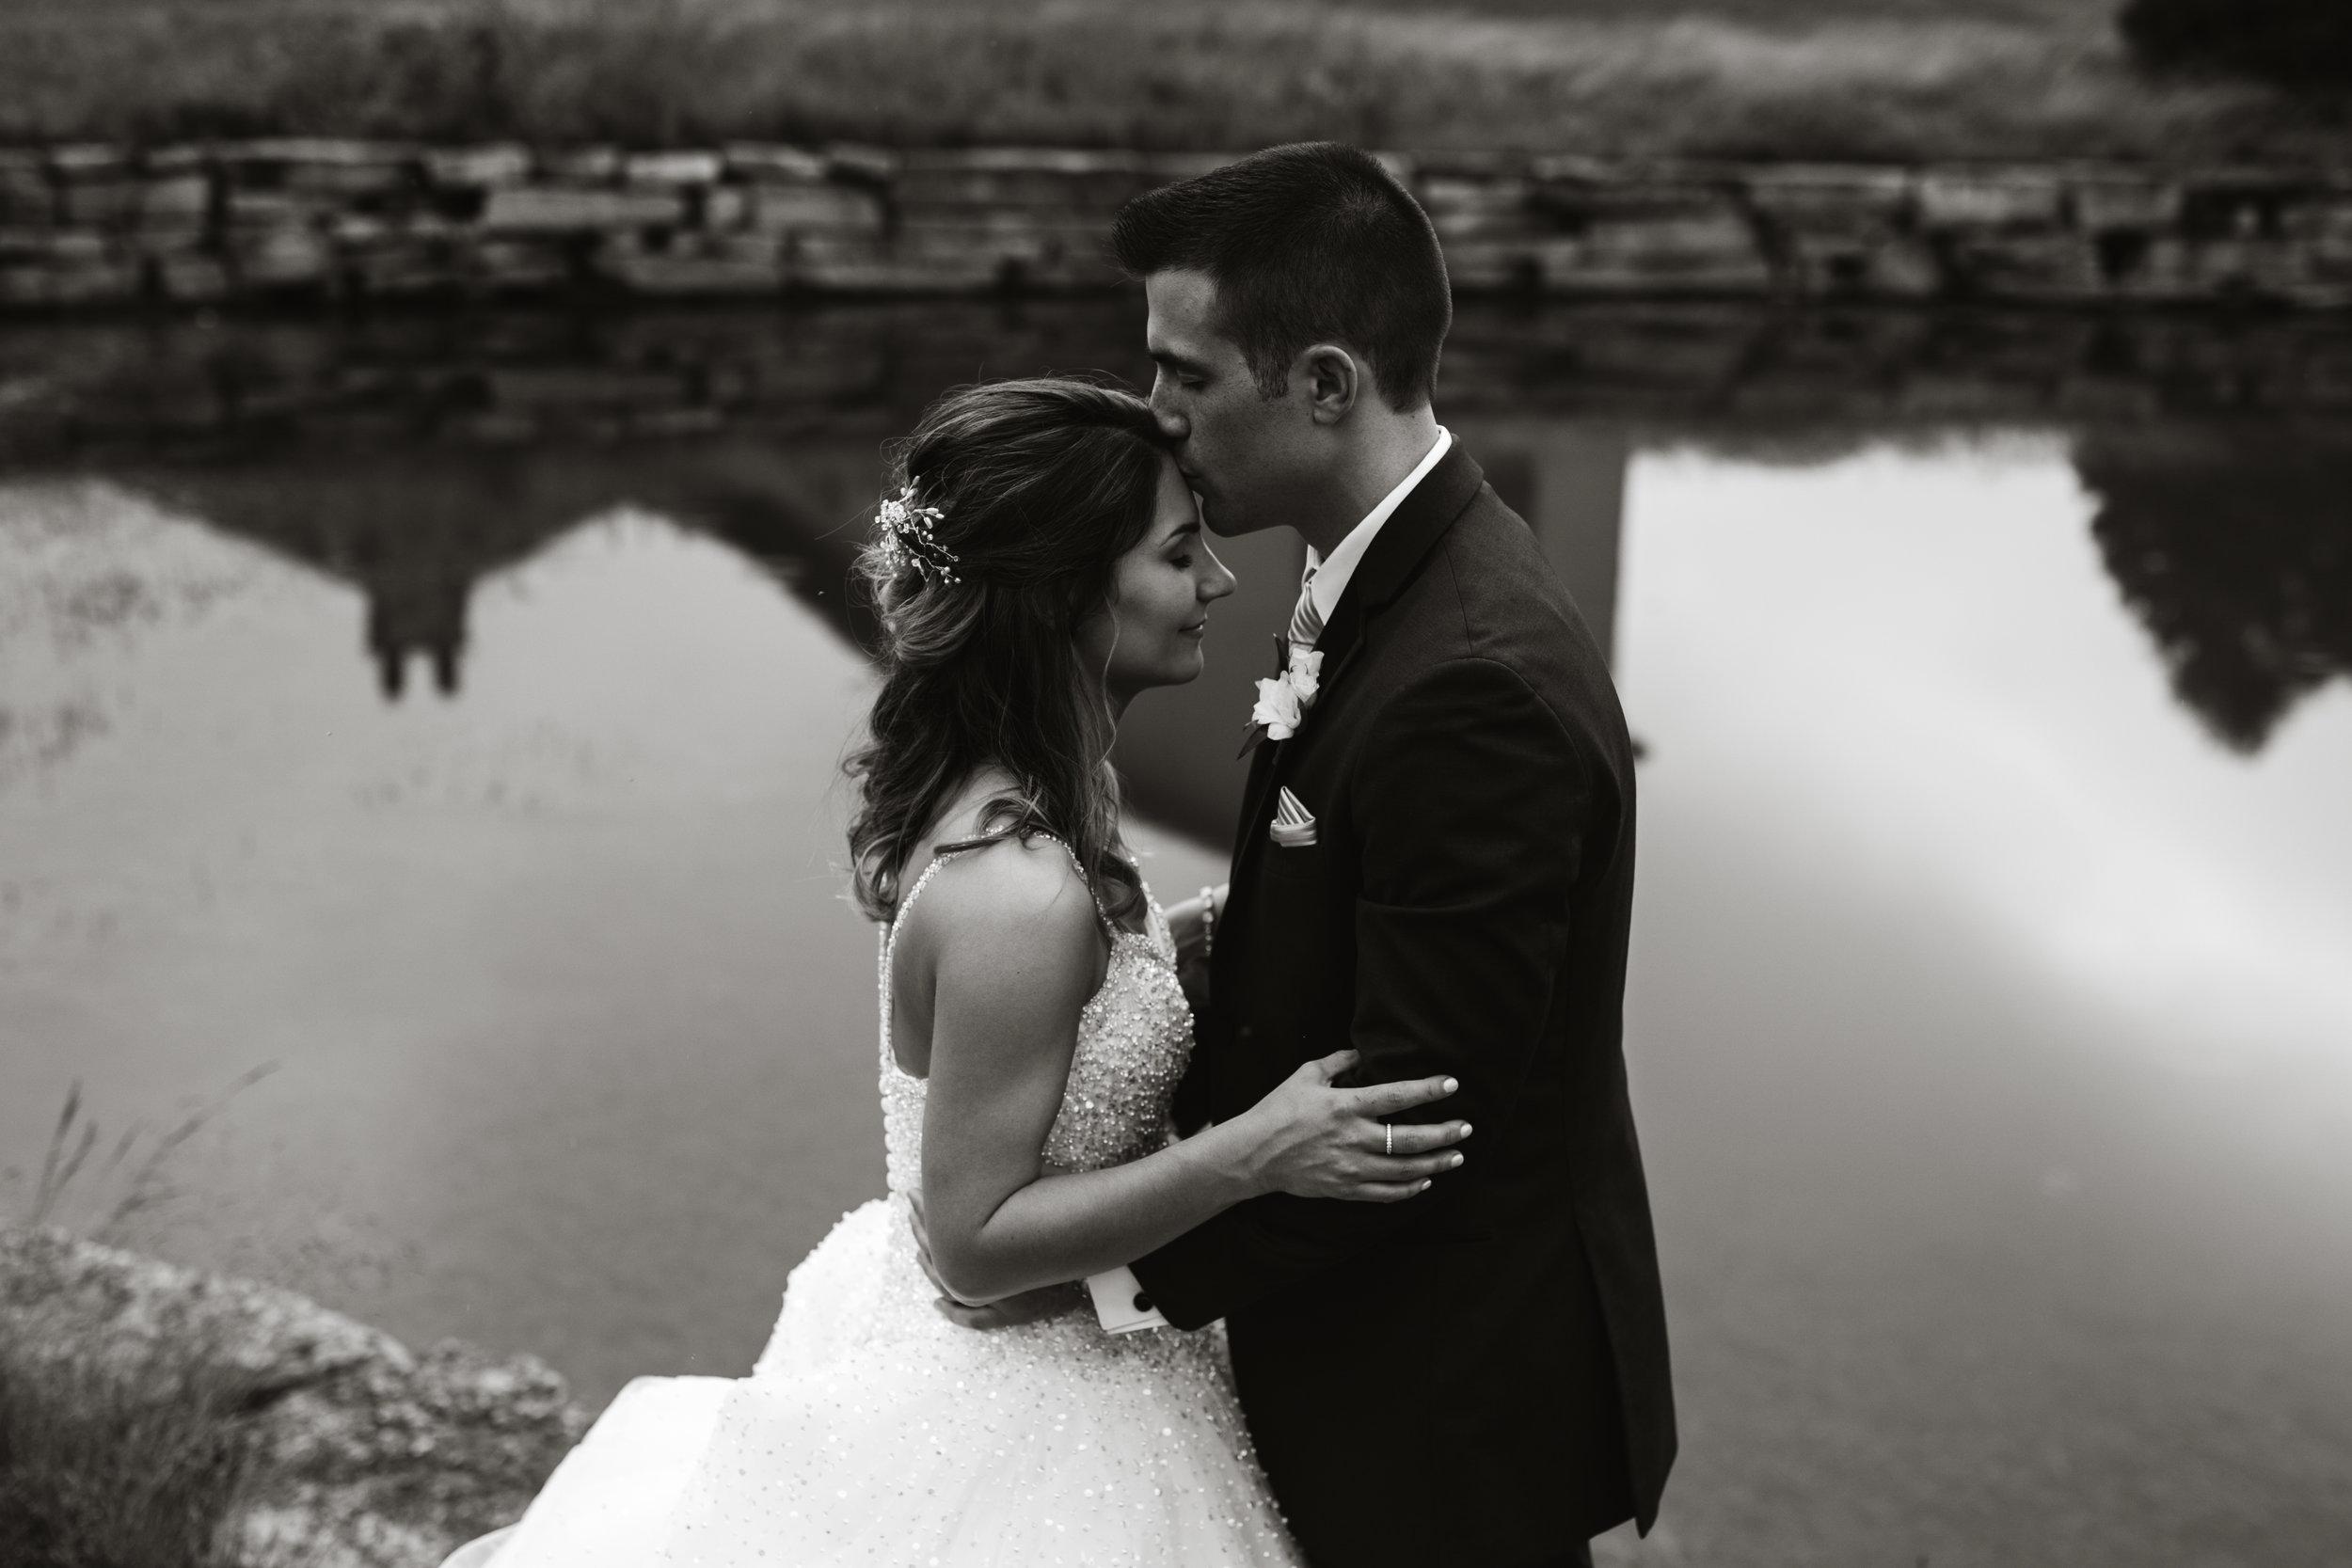 Wedding-couple-takes-photos-at-lowes-hardware-due-to-rain4.jpg